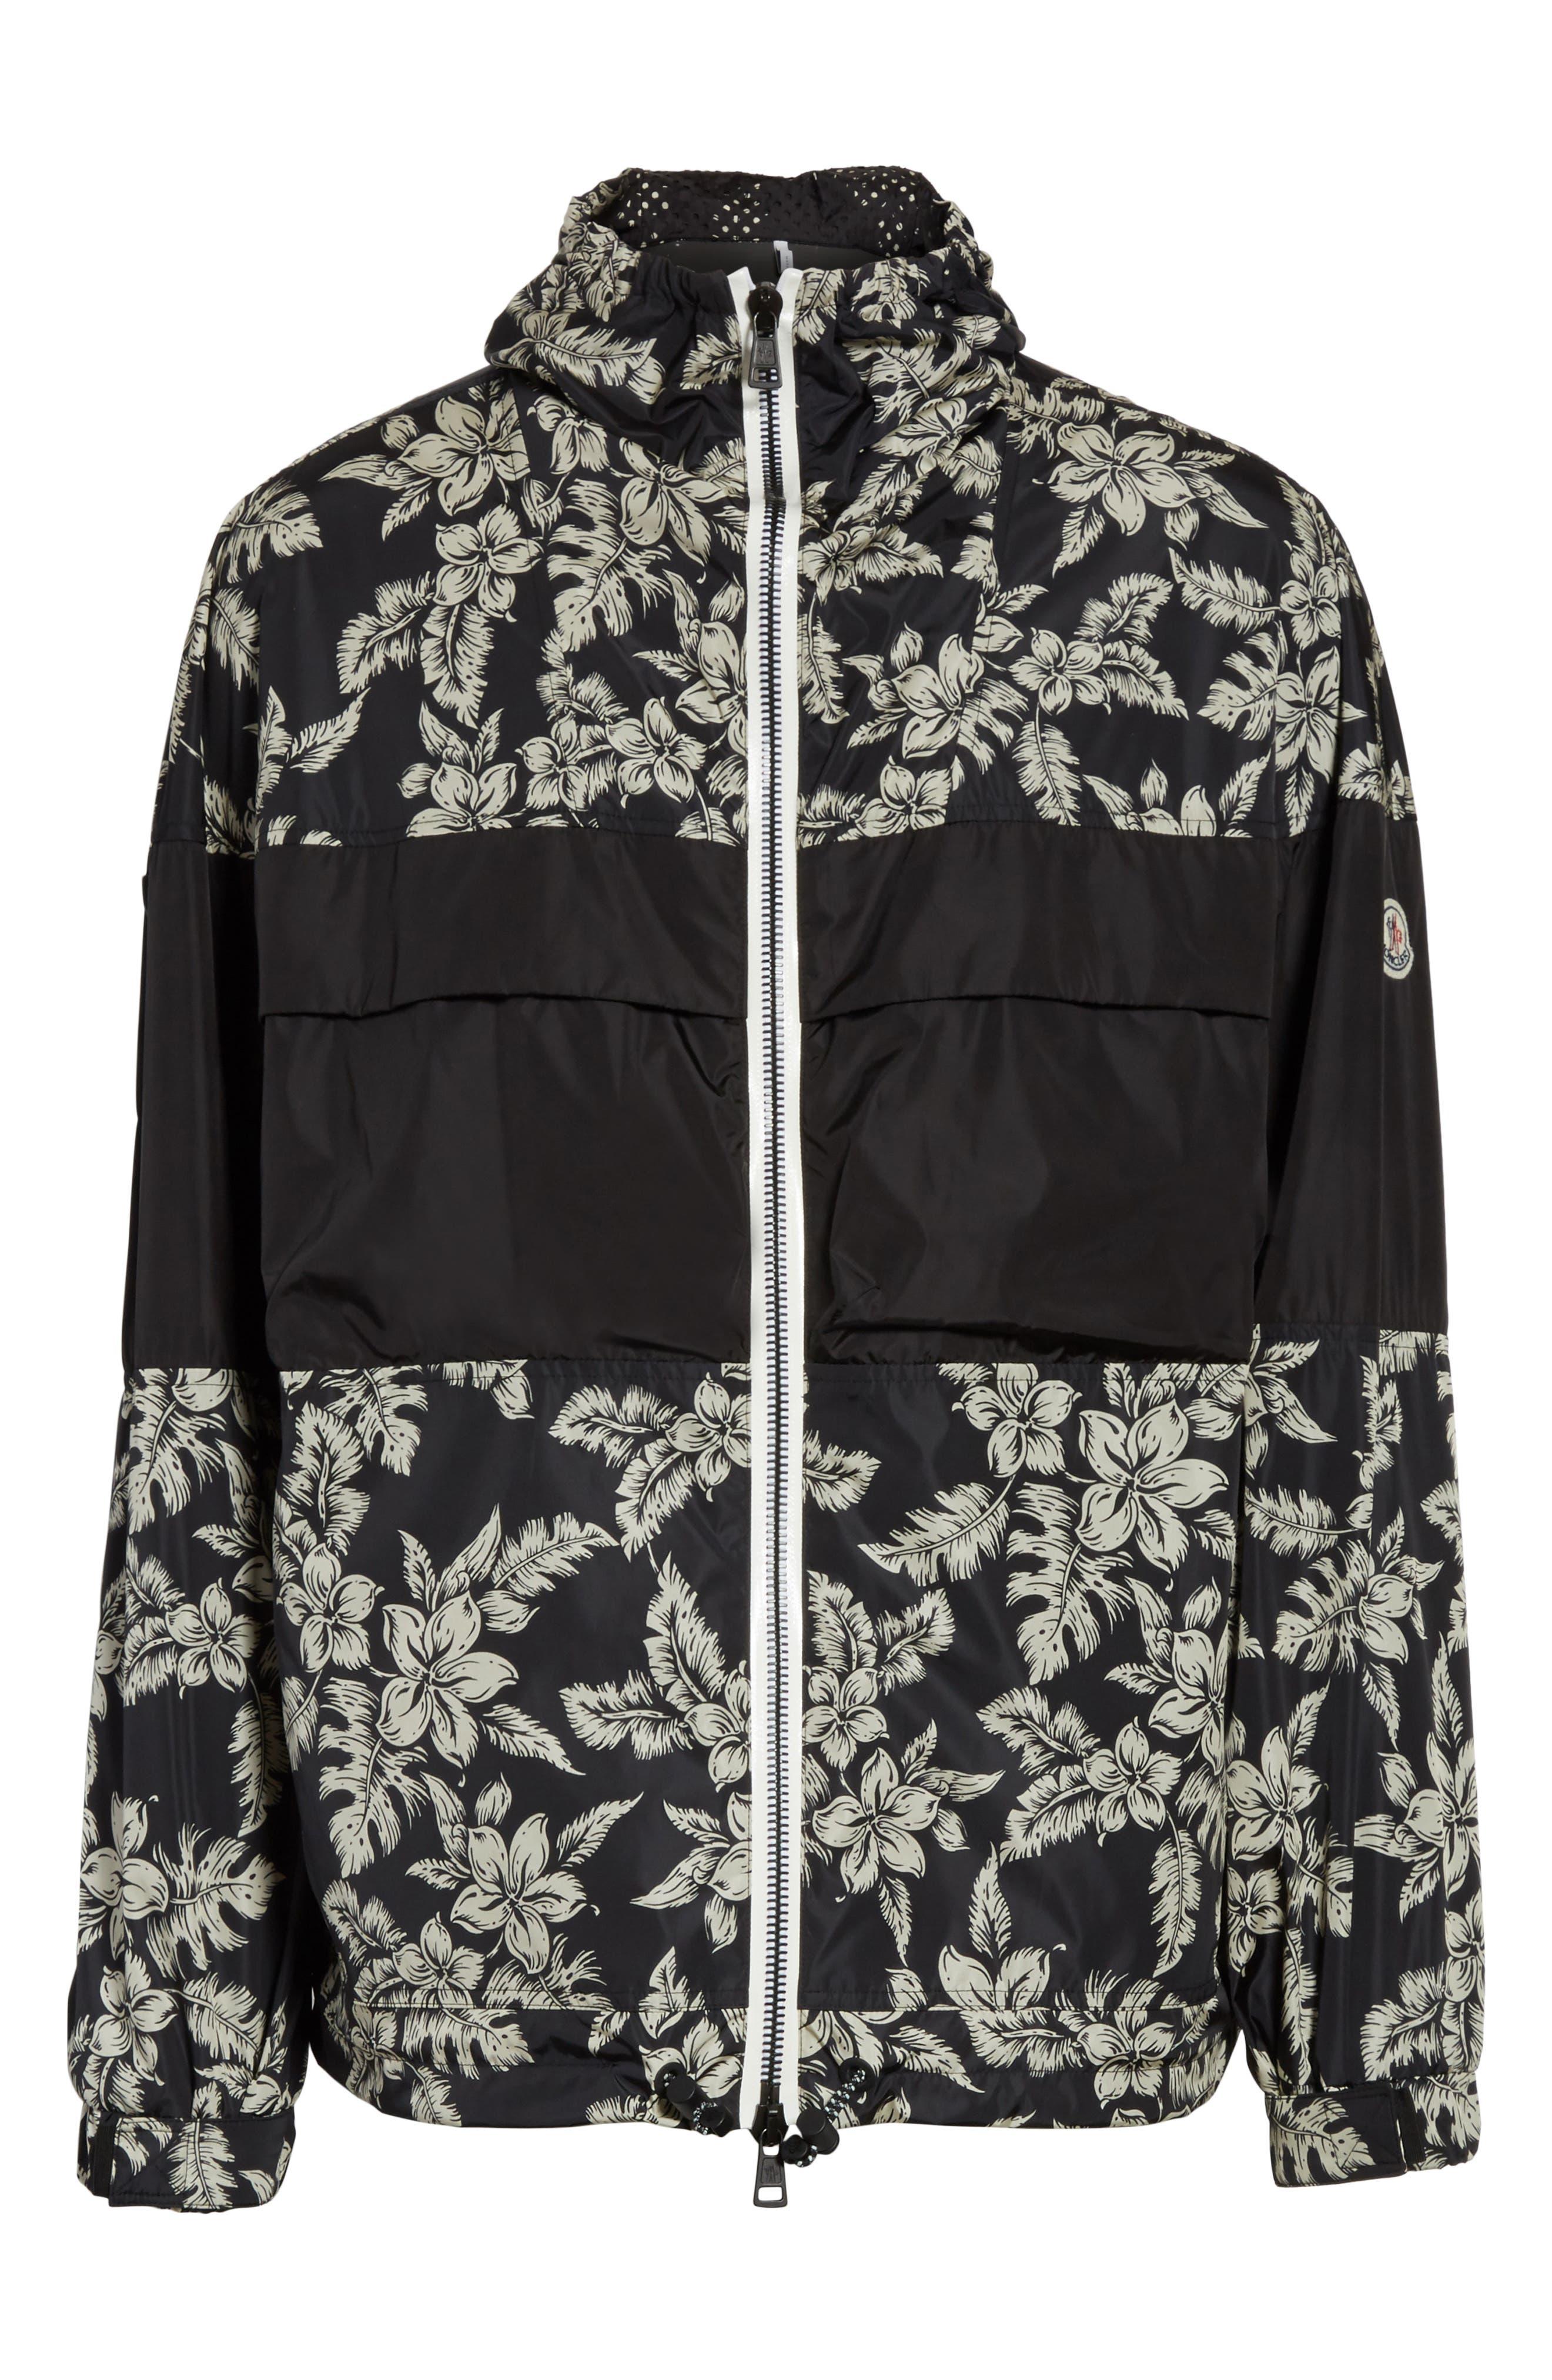 Thiou Floral Print Jacket,                             Alternate thumbnail 5, color,                             BLACK